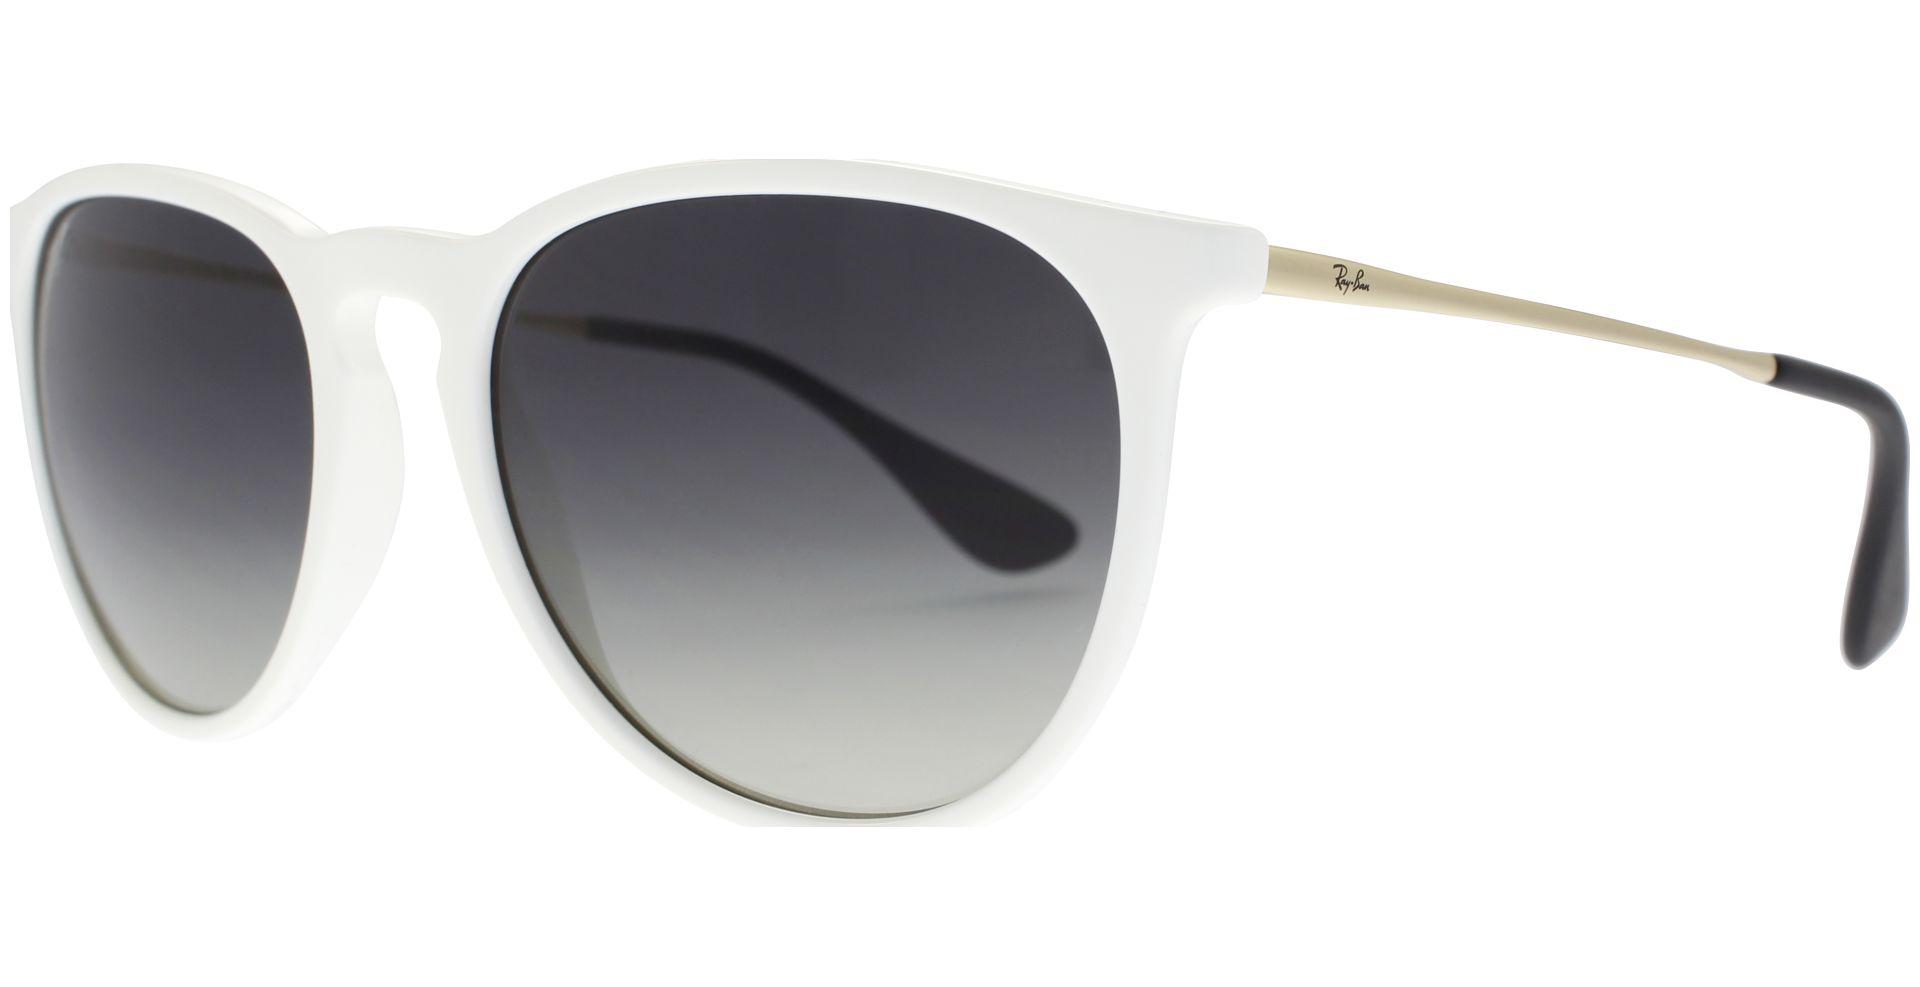 ff24d8eb24b23e Ray-Ban - Erika 4171 631411 5418 Shiny White - von Lensbest